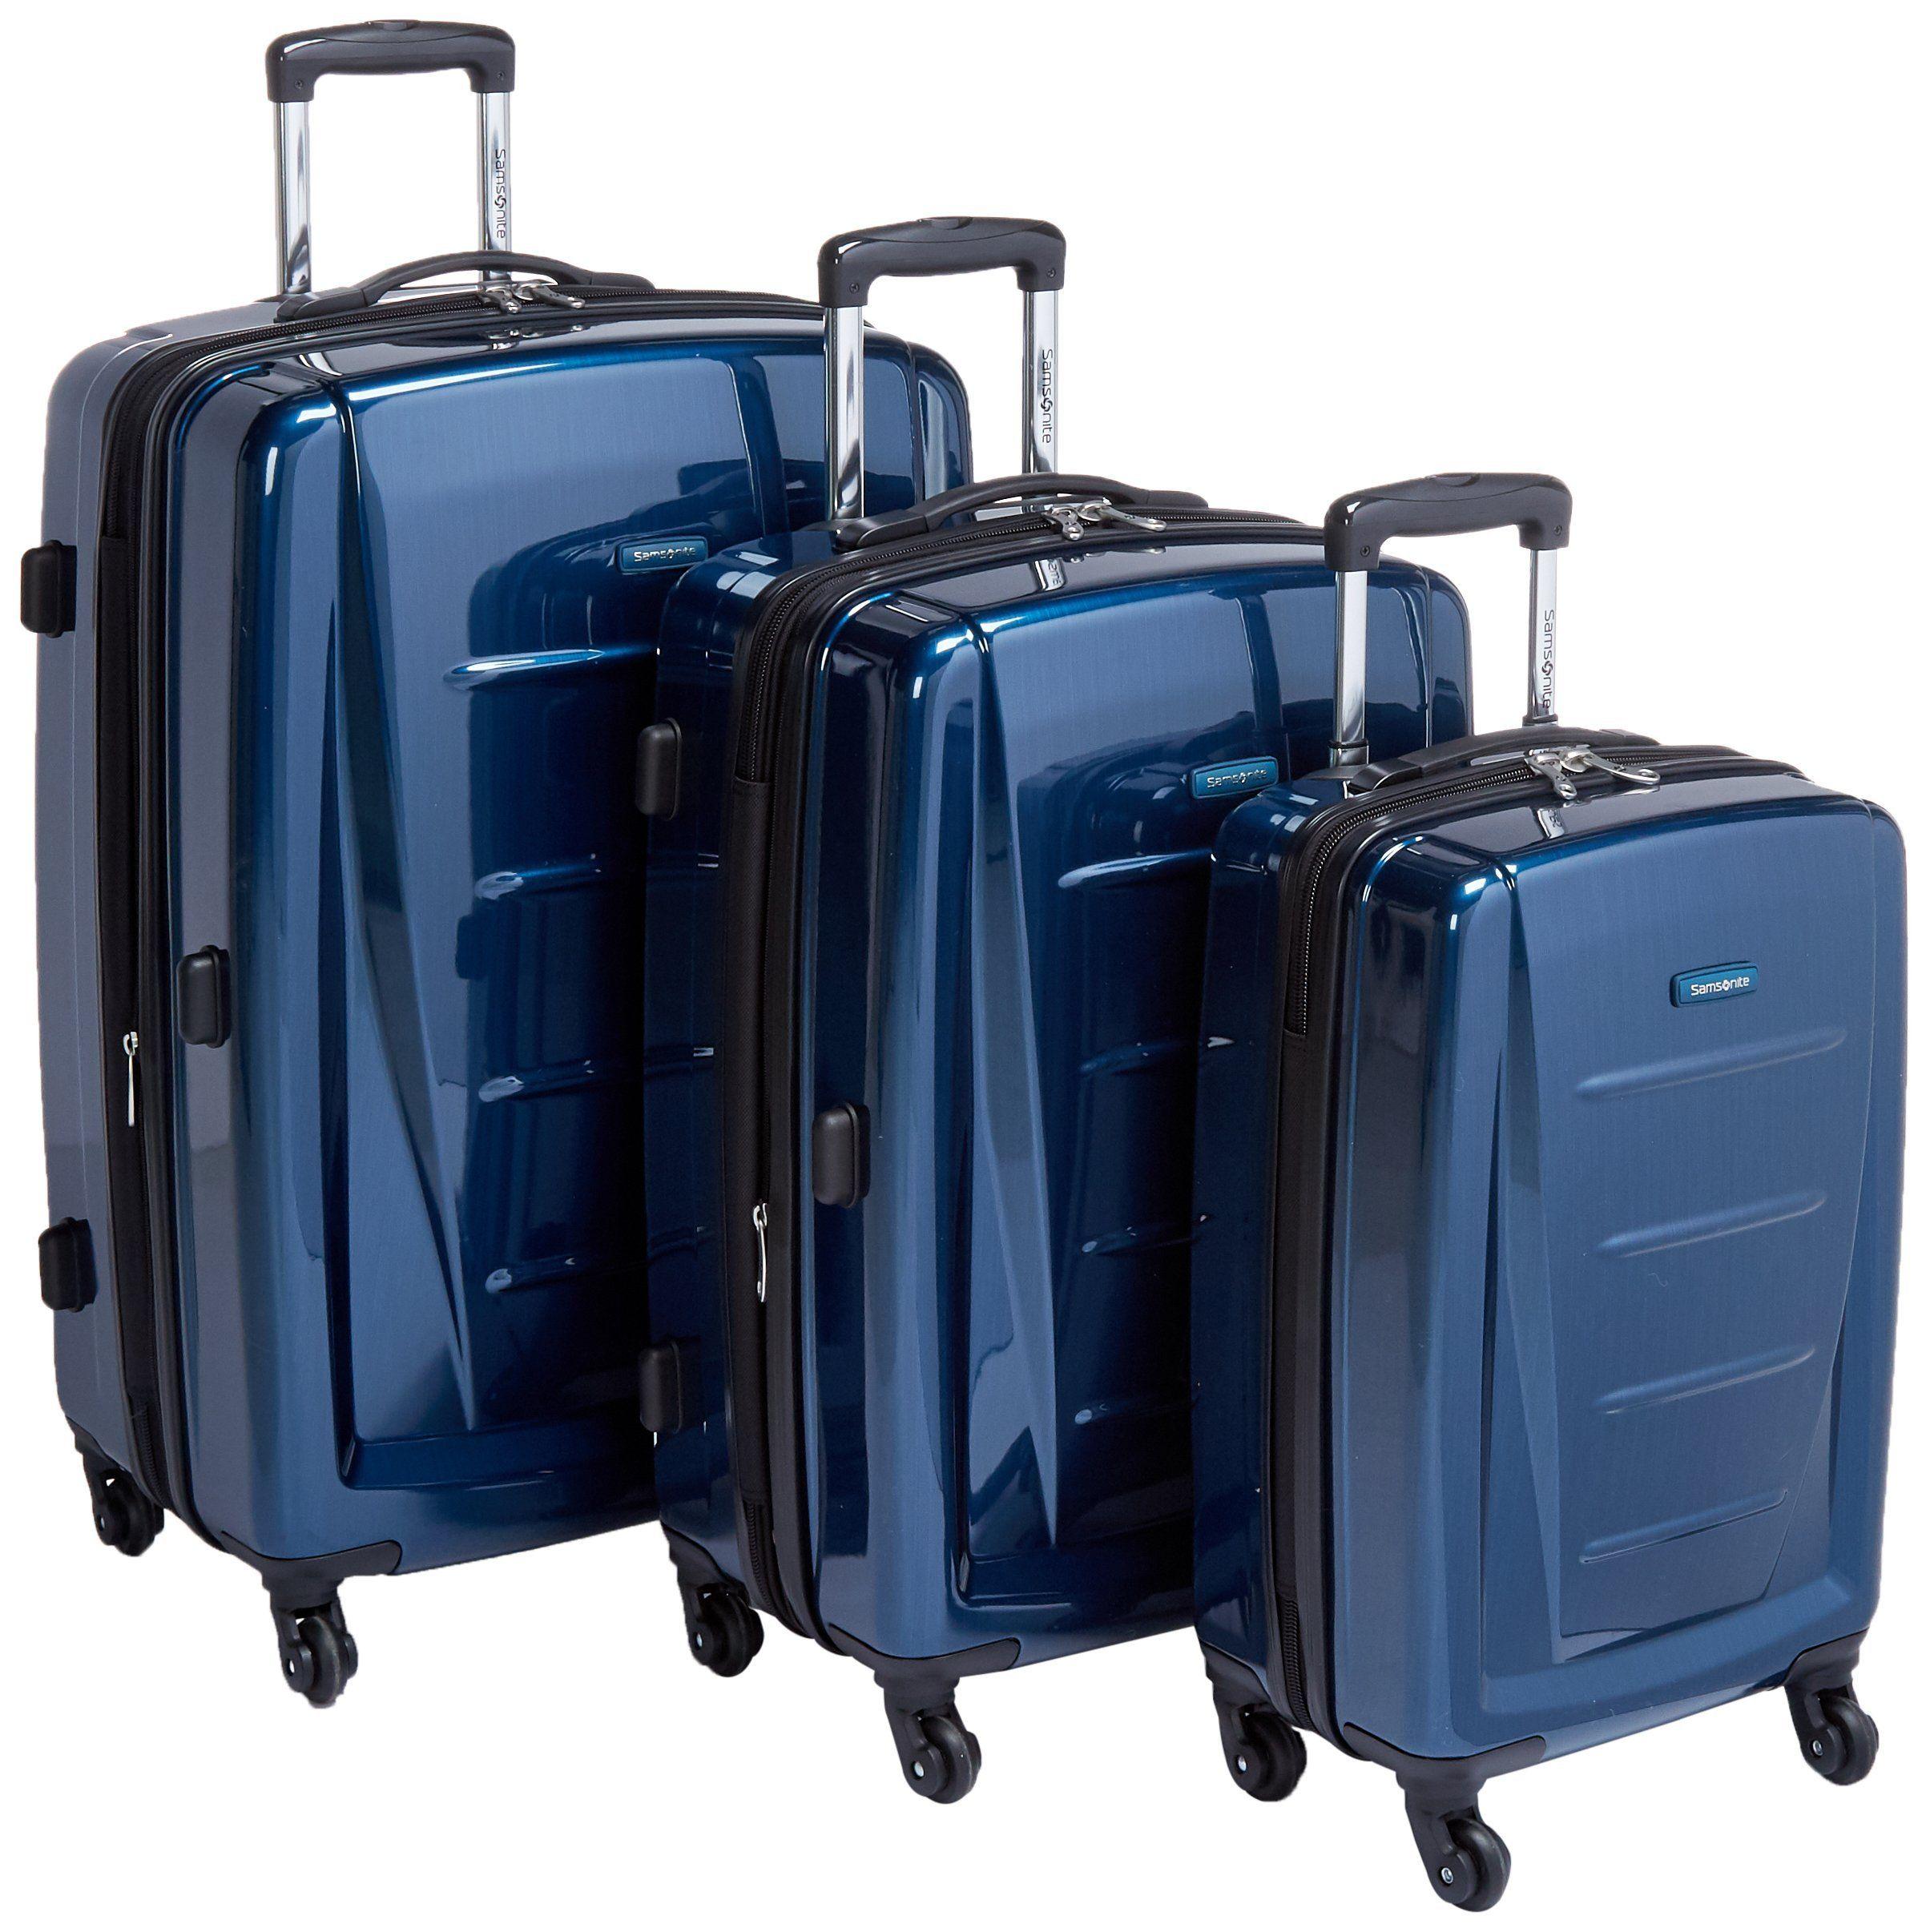 Samsonite Winfield 2 Hardside Luggage With Spinner Wheels Lovely Novelty Hardside Luggage Best Luggage Samsonite Luggage